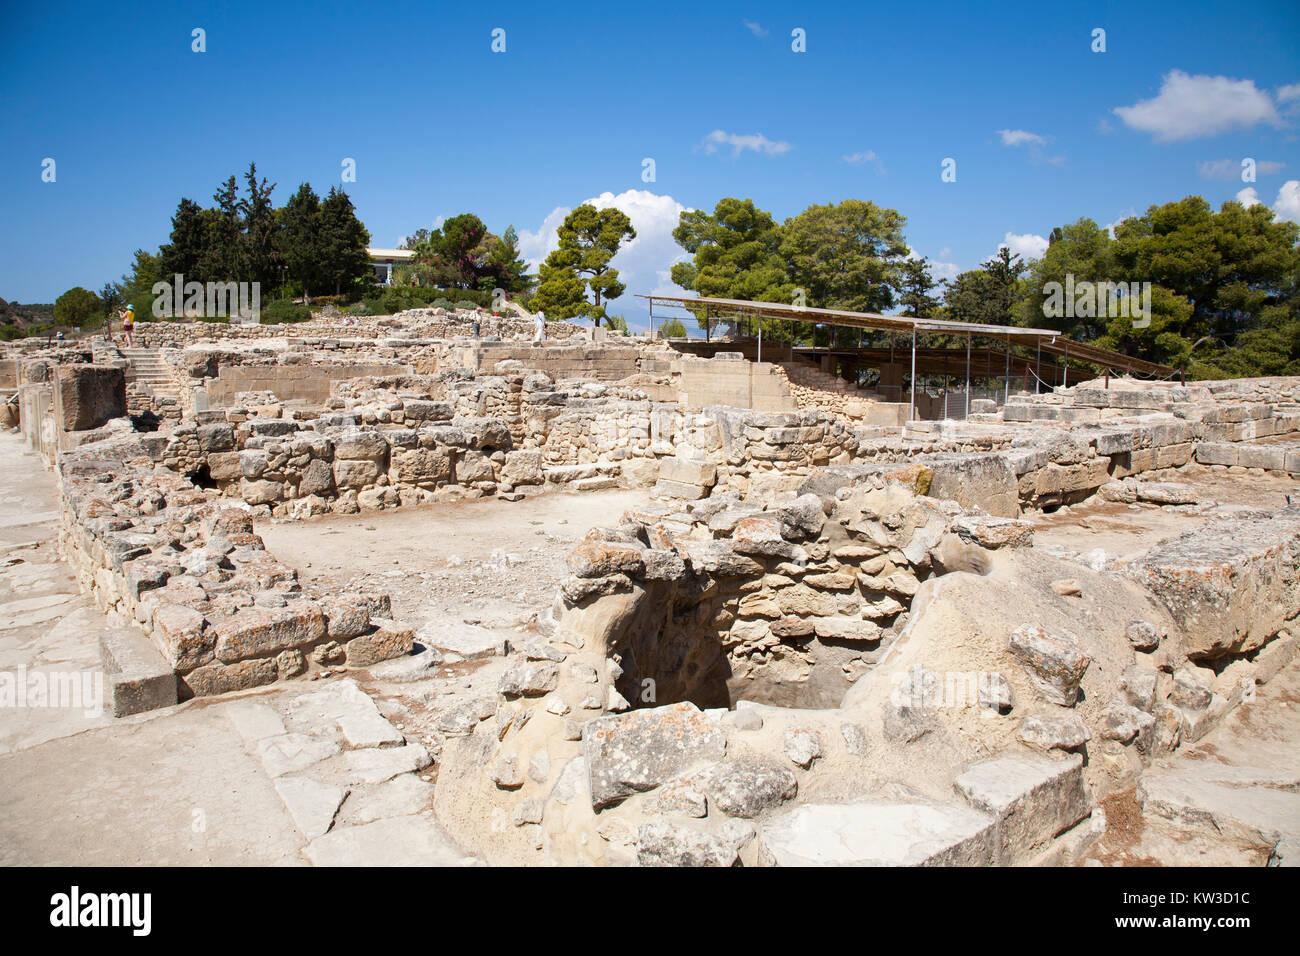 Festos, archeological area, Crete island, Greece, Europe Stock Photo